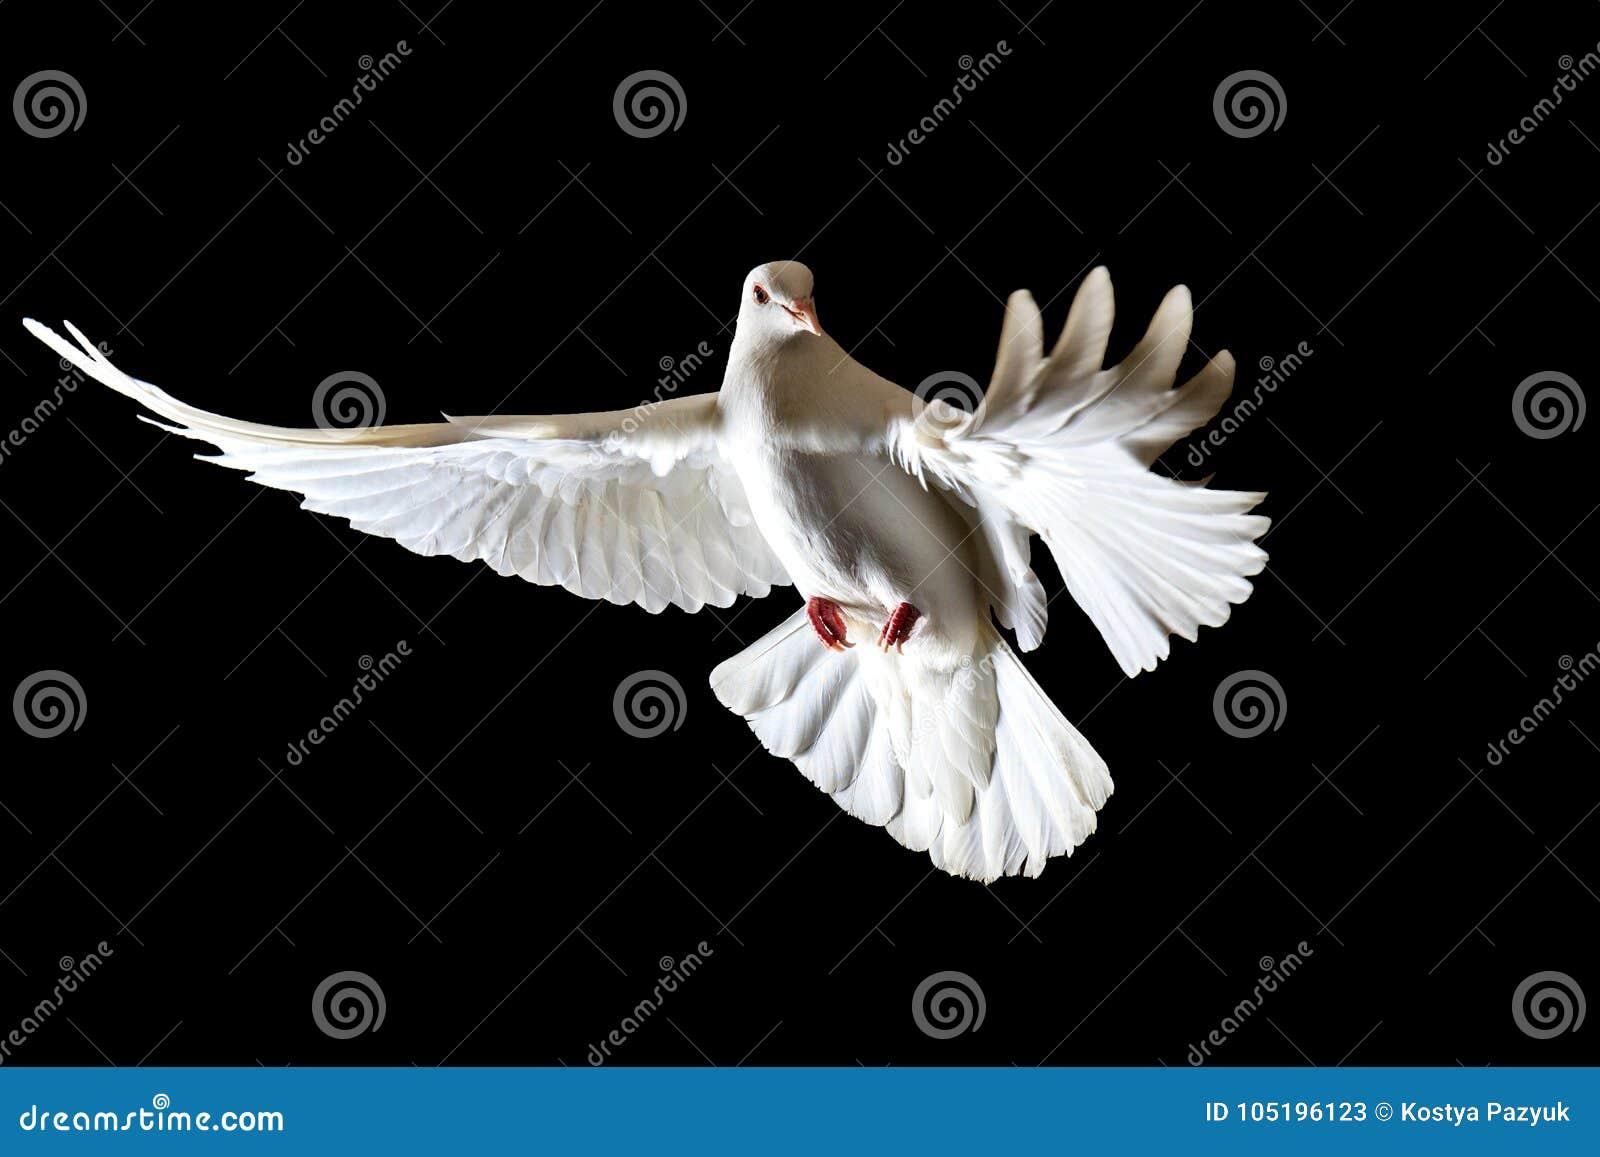 Symbol Of Freedom White Doves Flying On A Black Background Stock